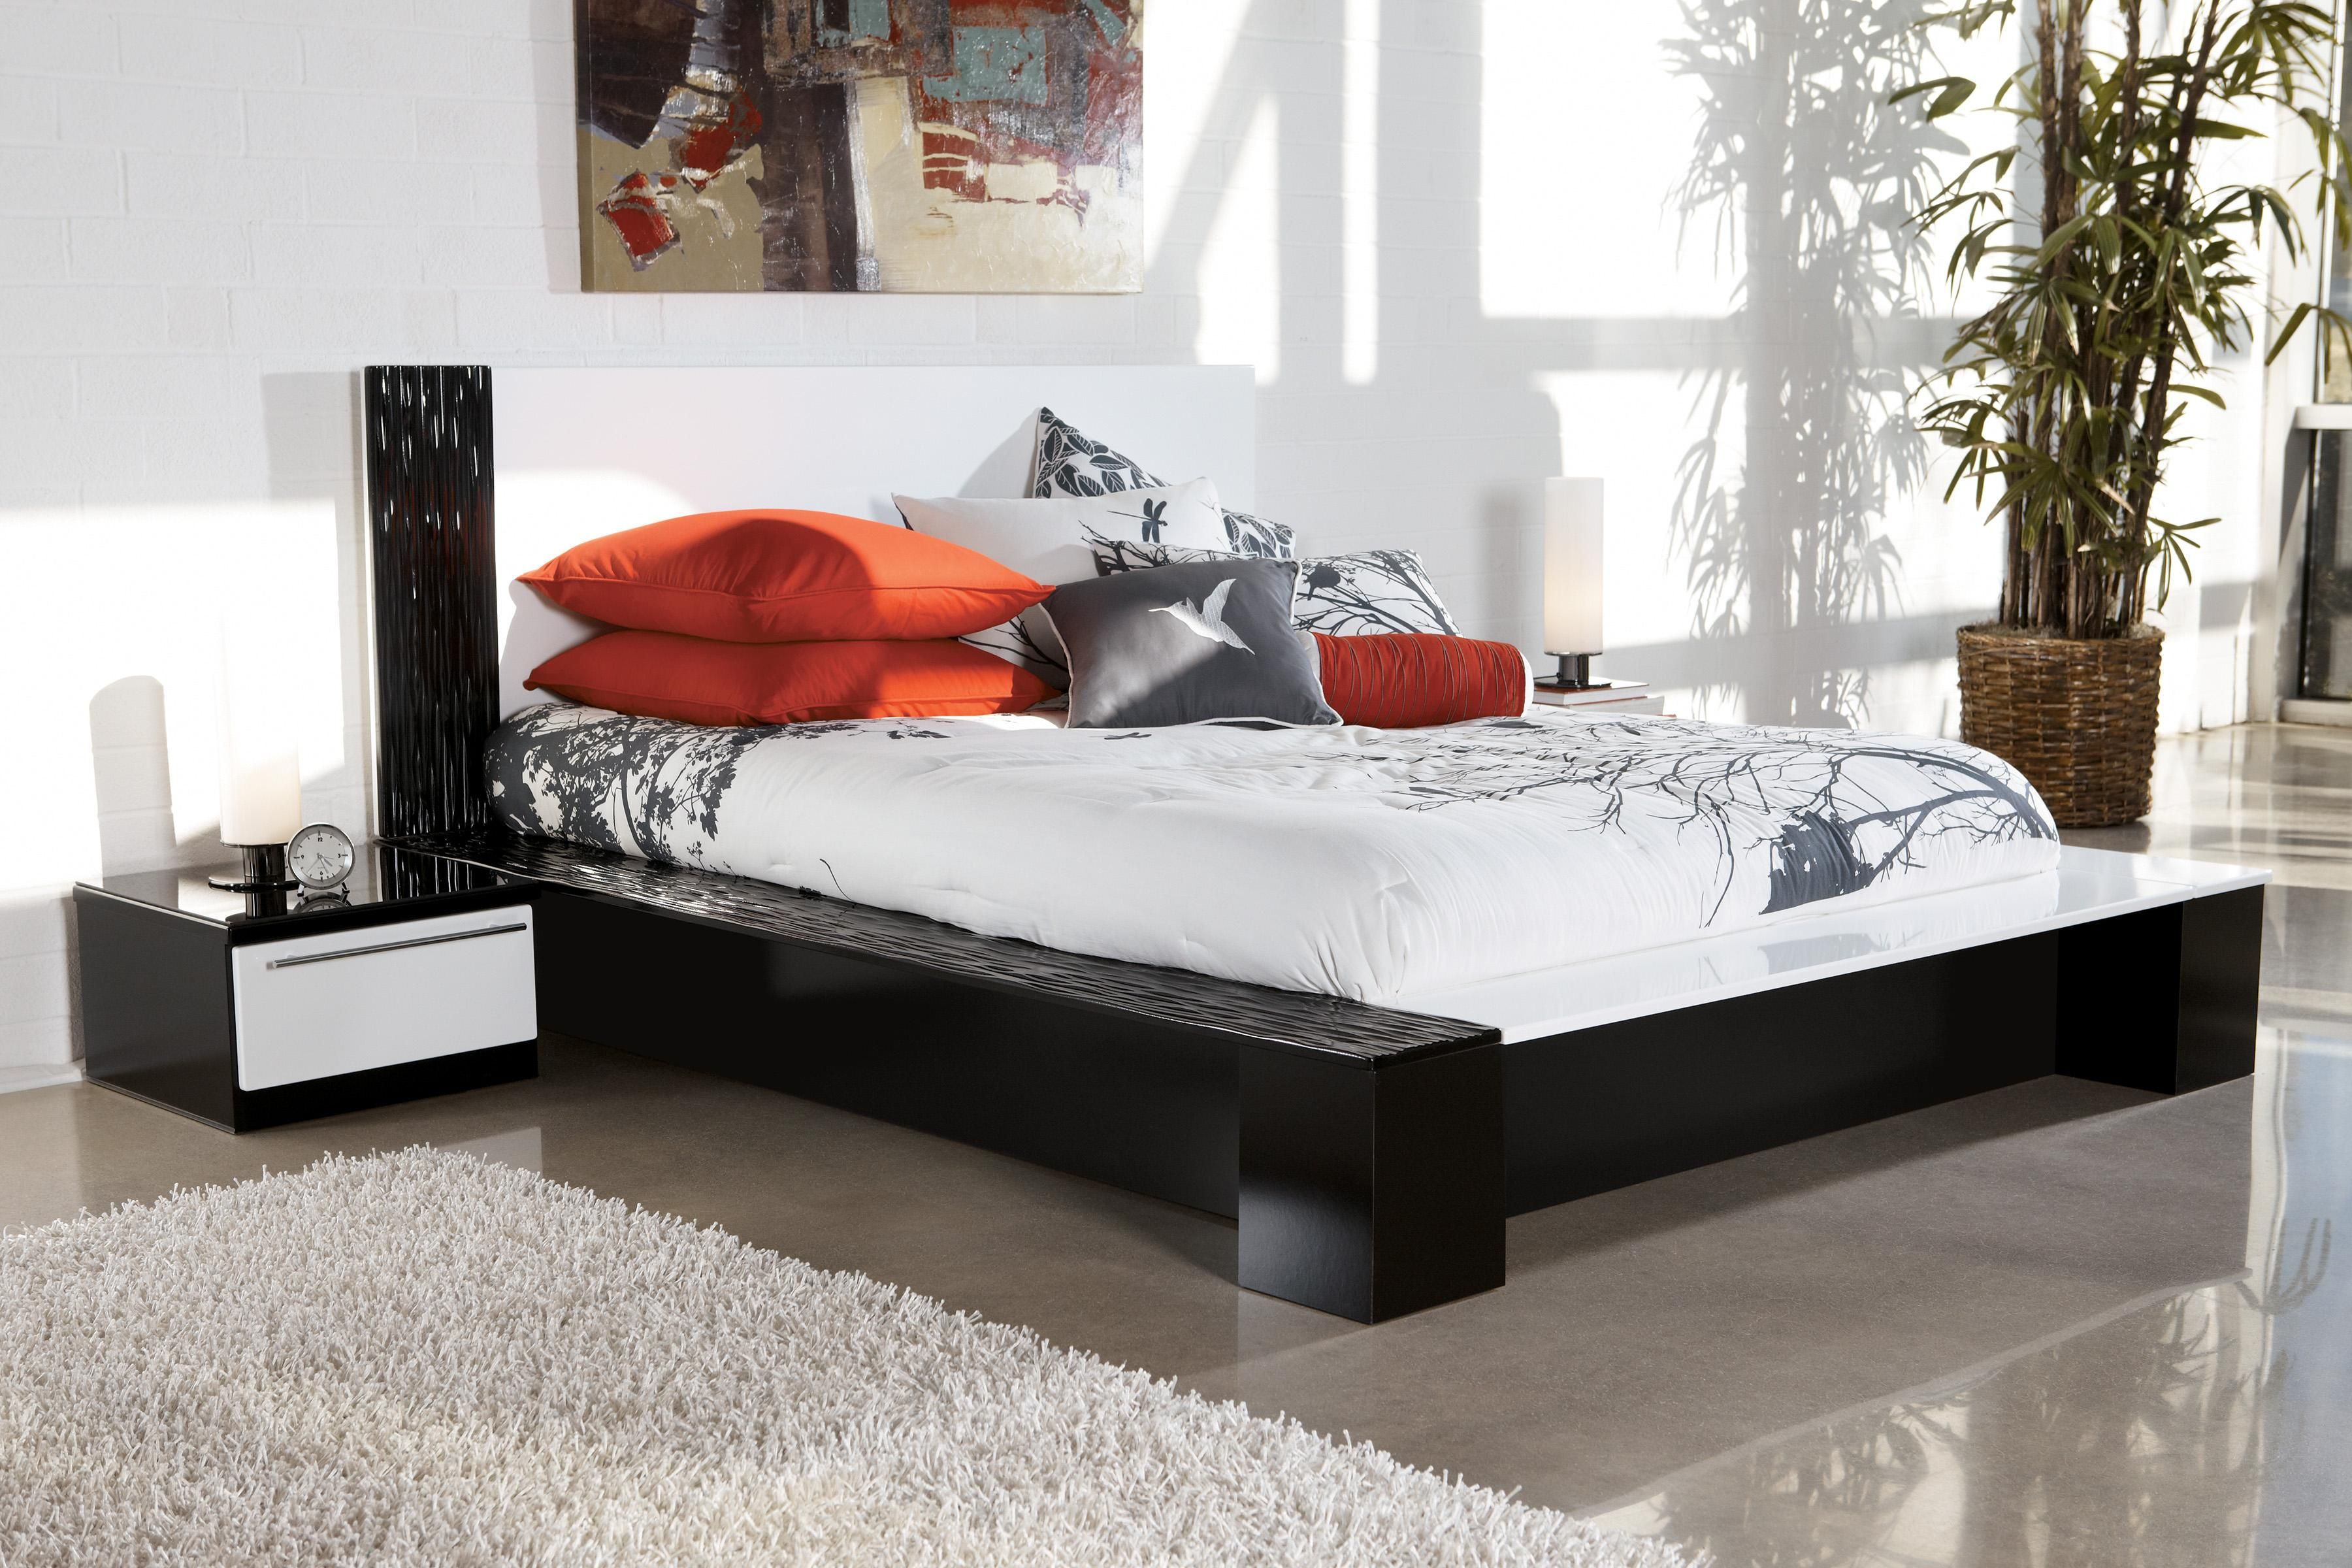 Metro Bedroom Furniture Piroska Queen Metro Modern Black White Platform Bed By Ashley